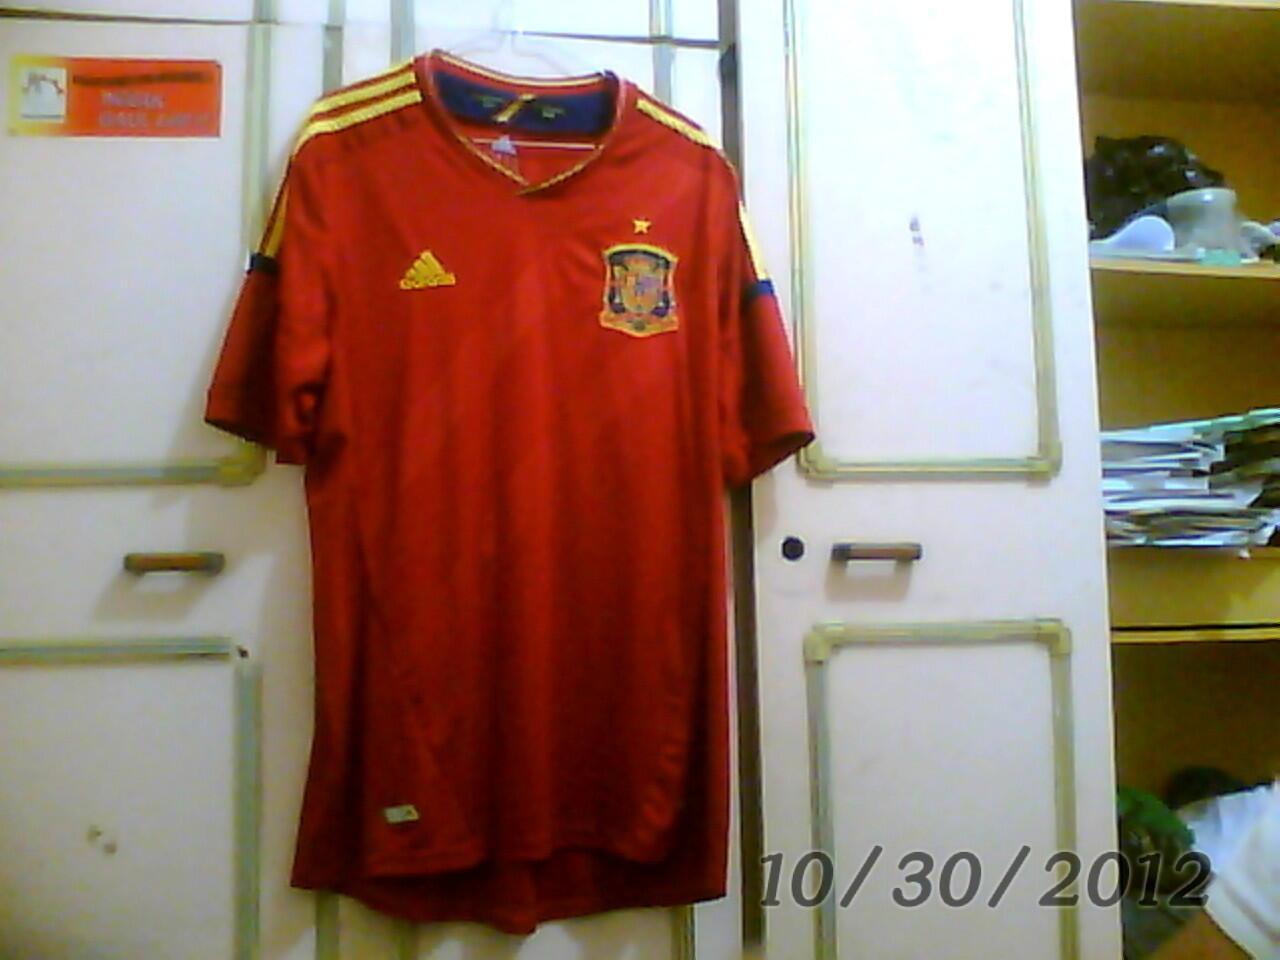 For Sale Jersey madrid, arsenal, paraguay (GARAGE SALE)